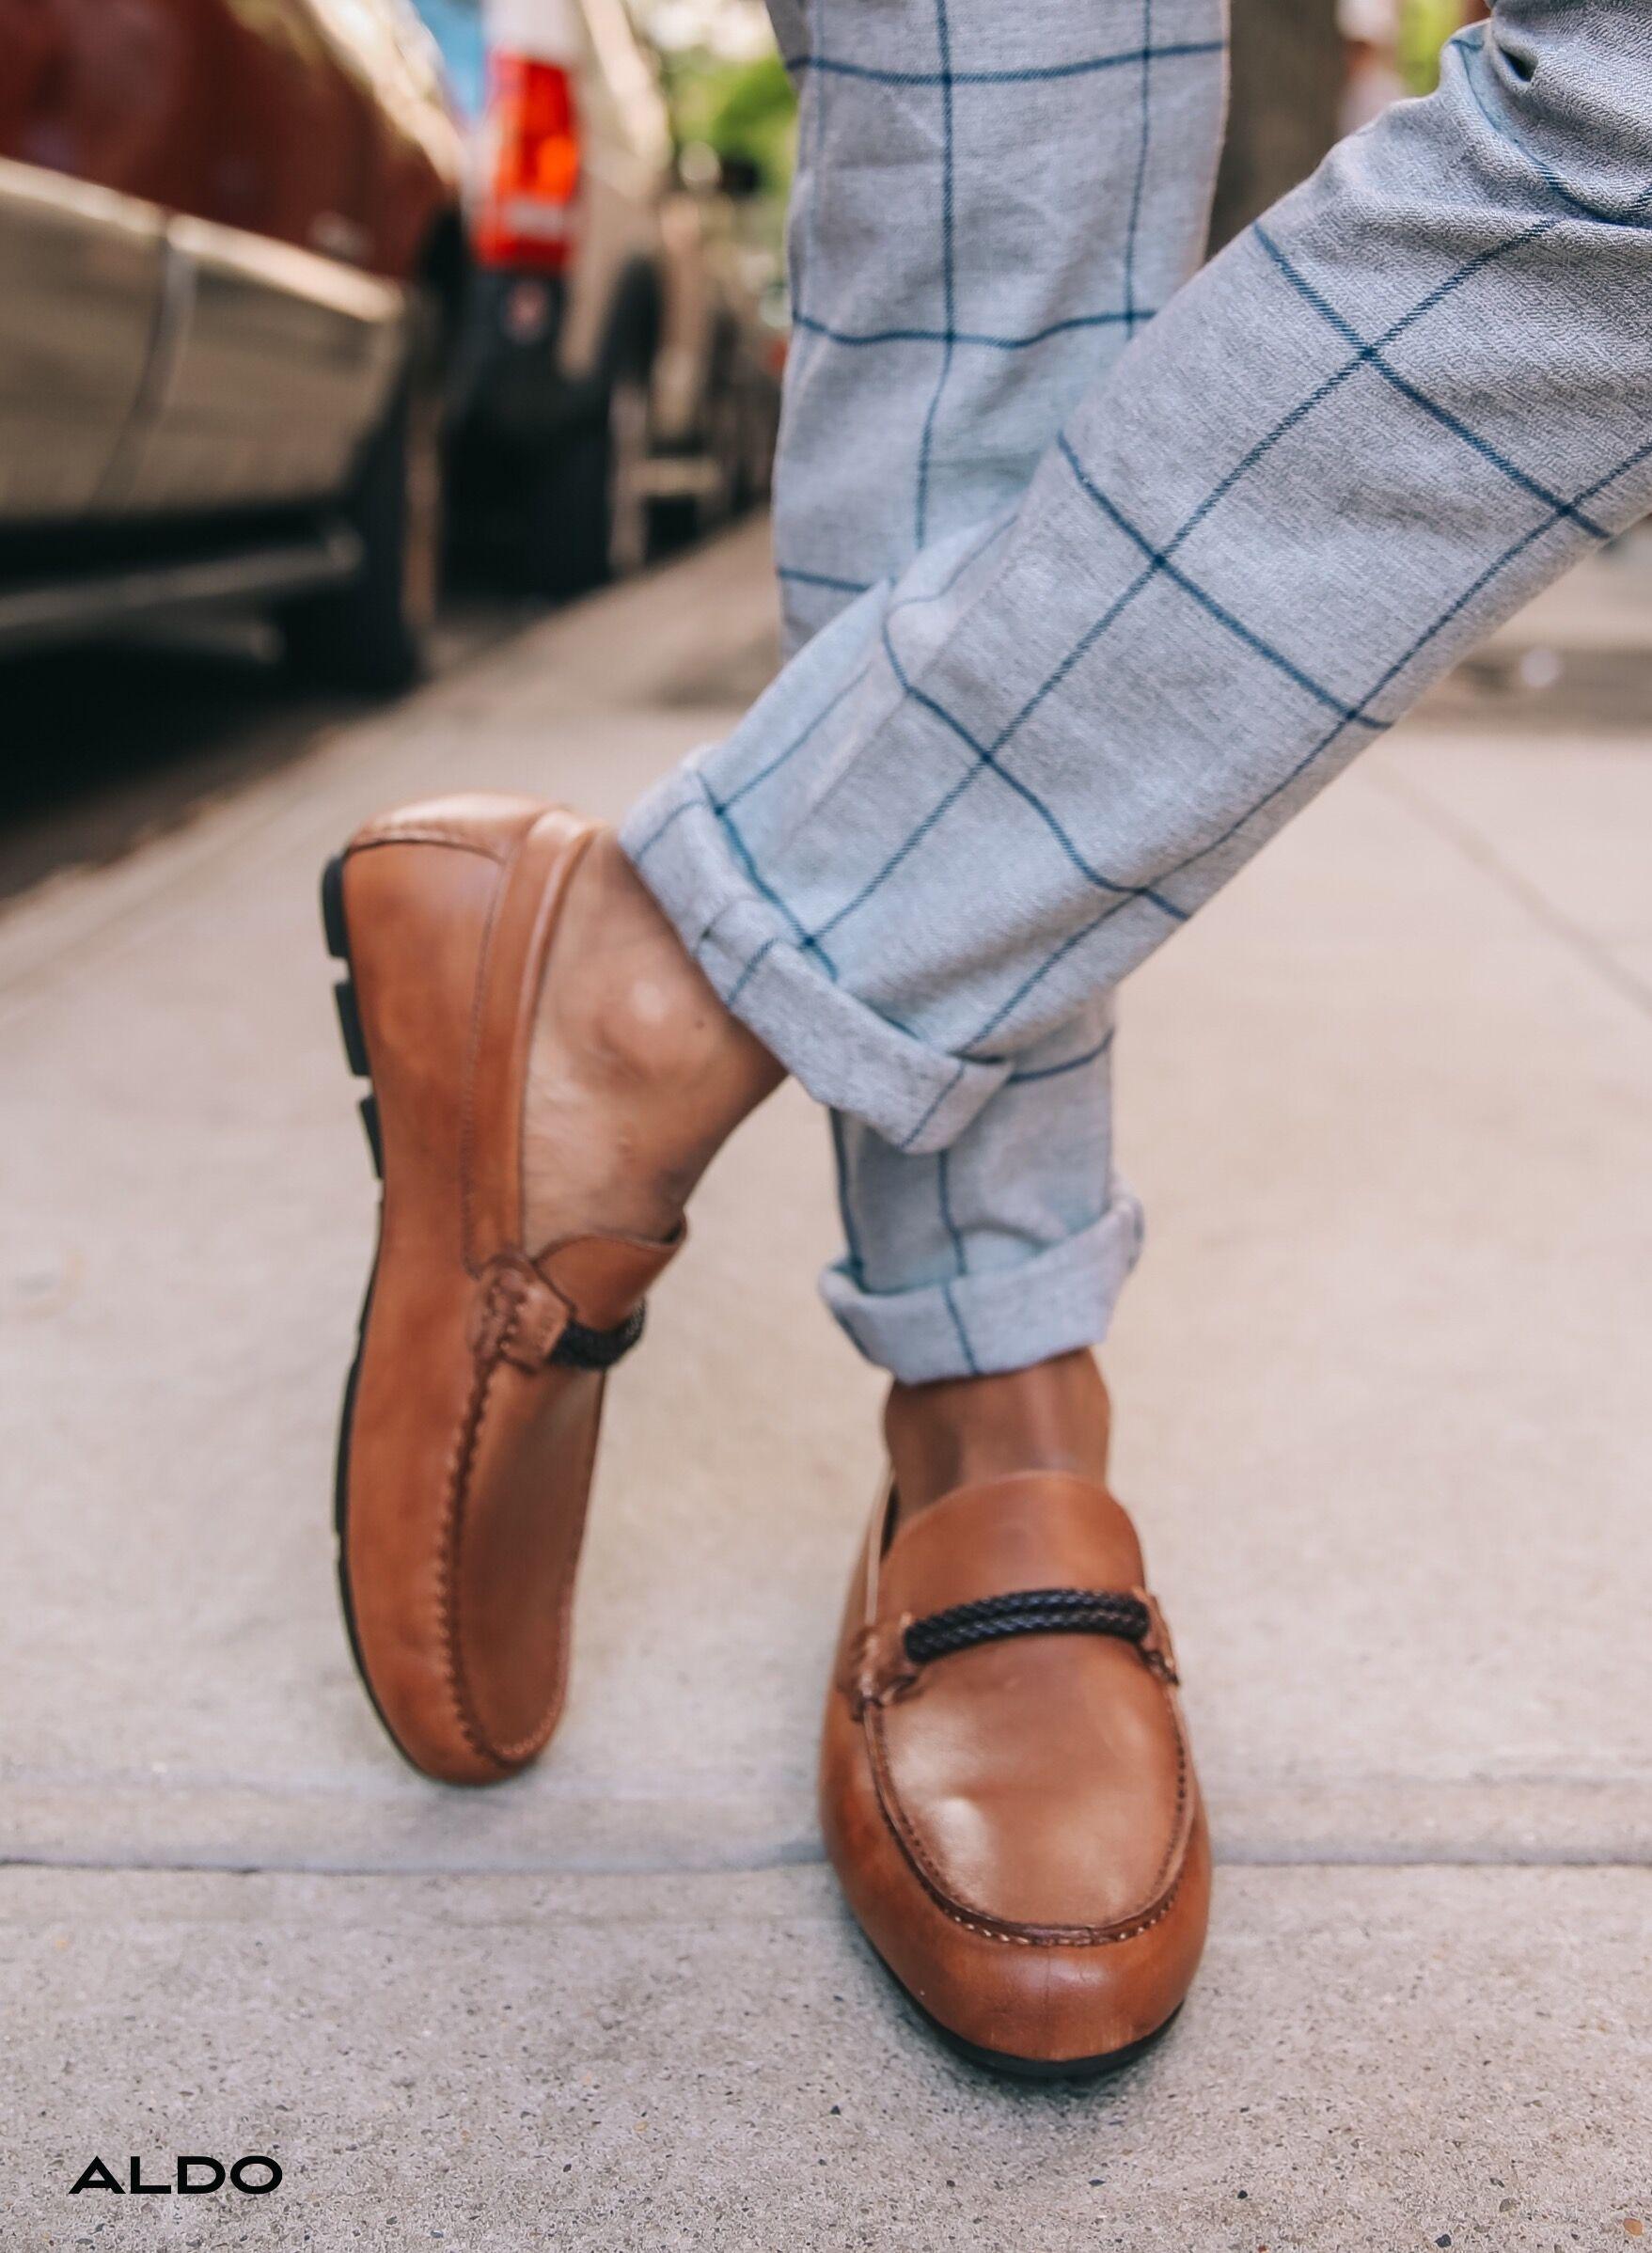 Aldo Shoes men loafers for Fall | Mens